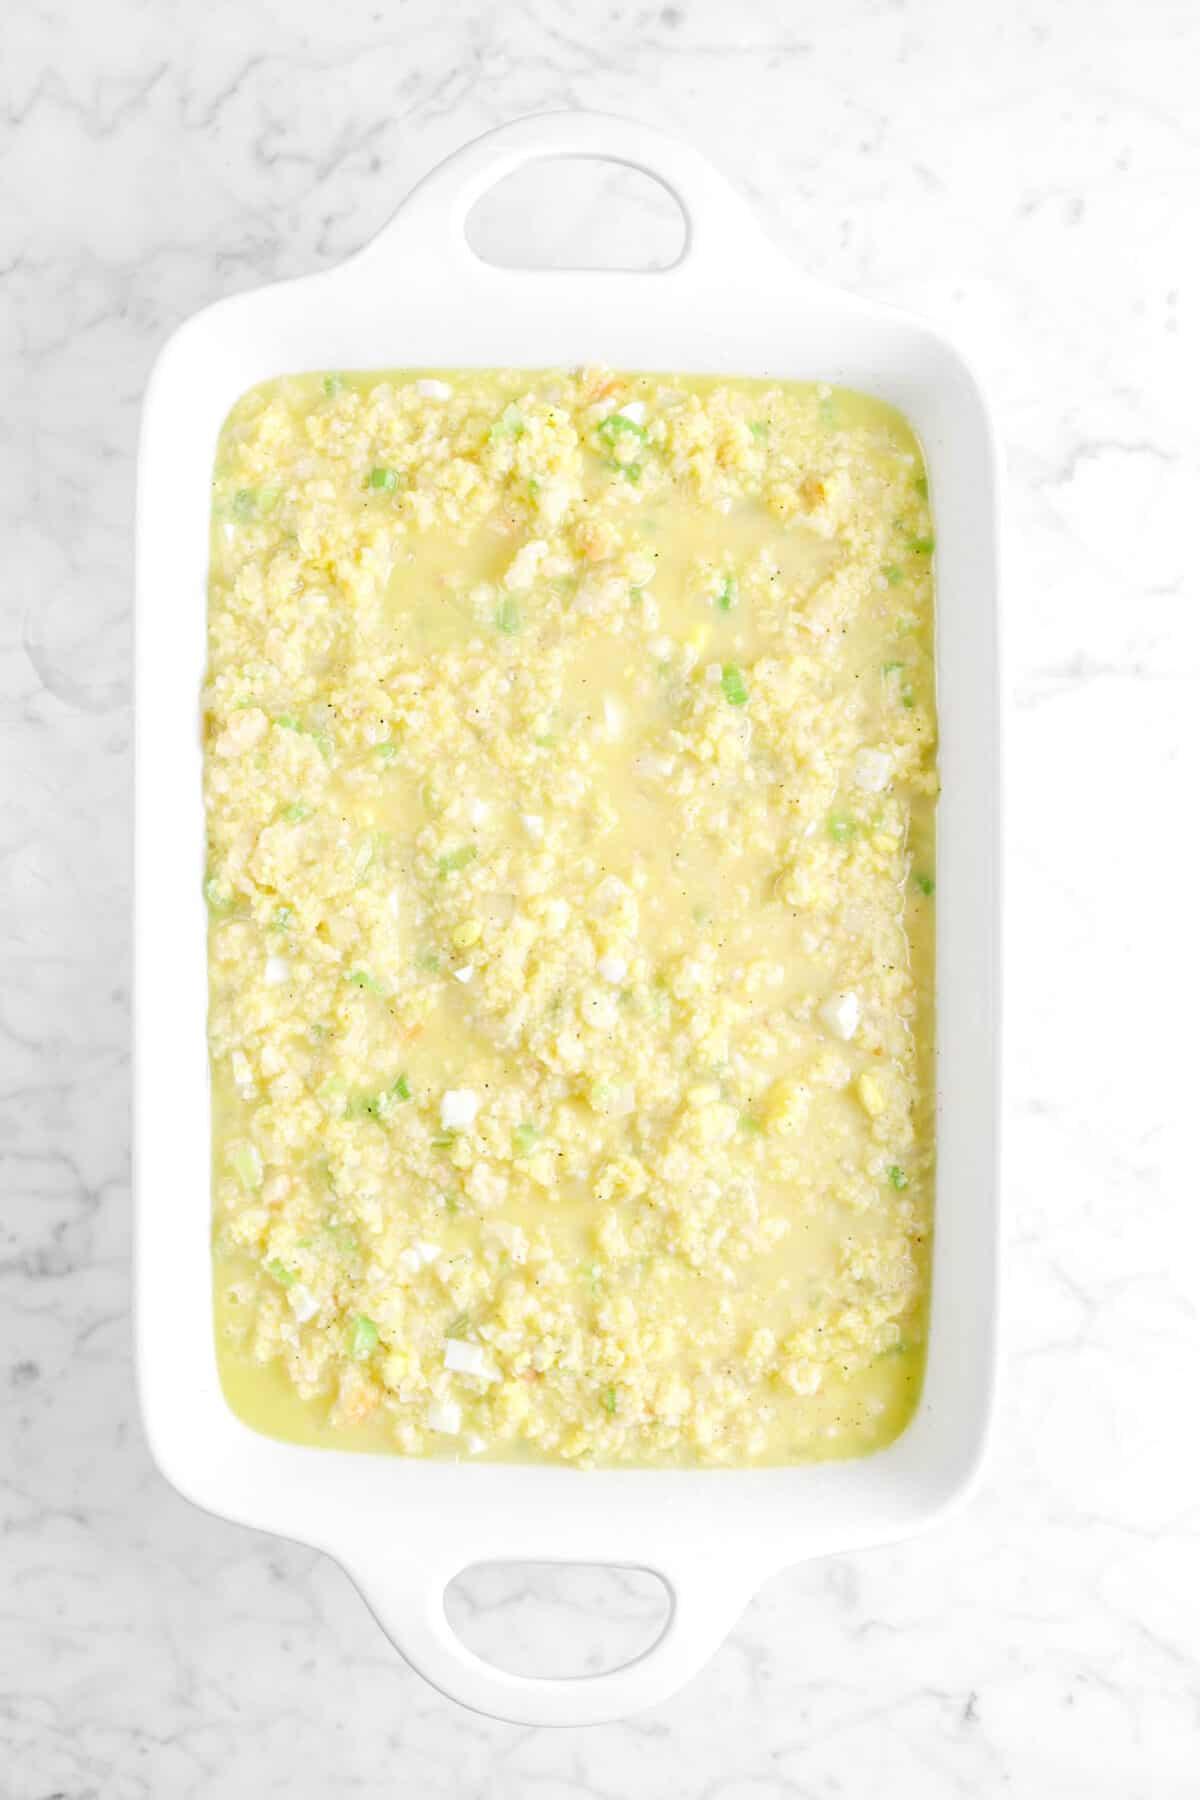 cornbread dressing added to white casserole